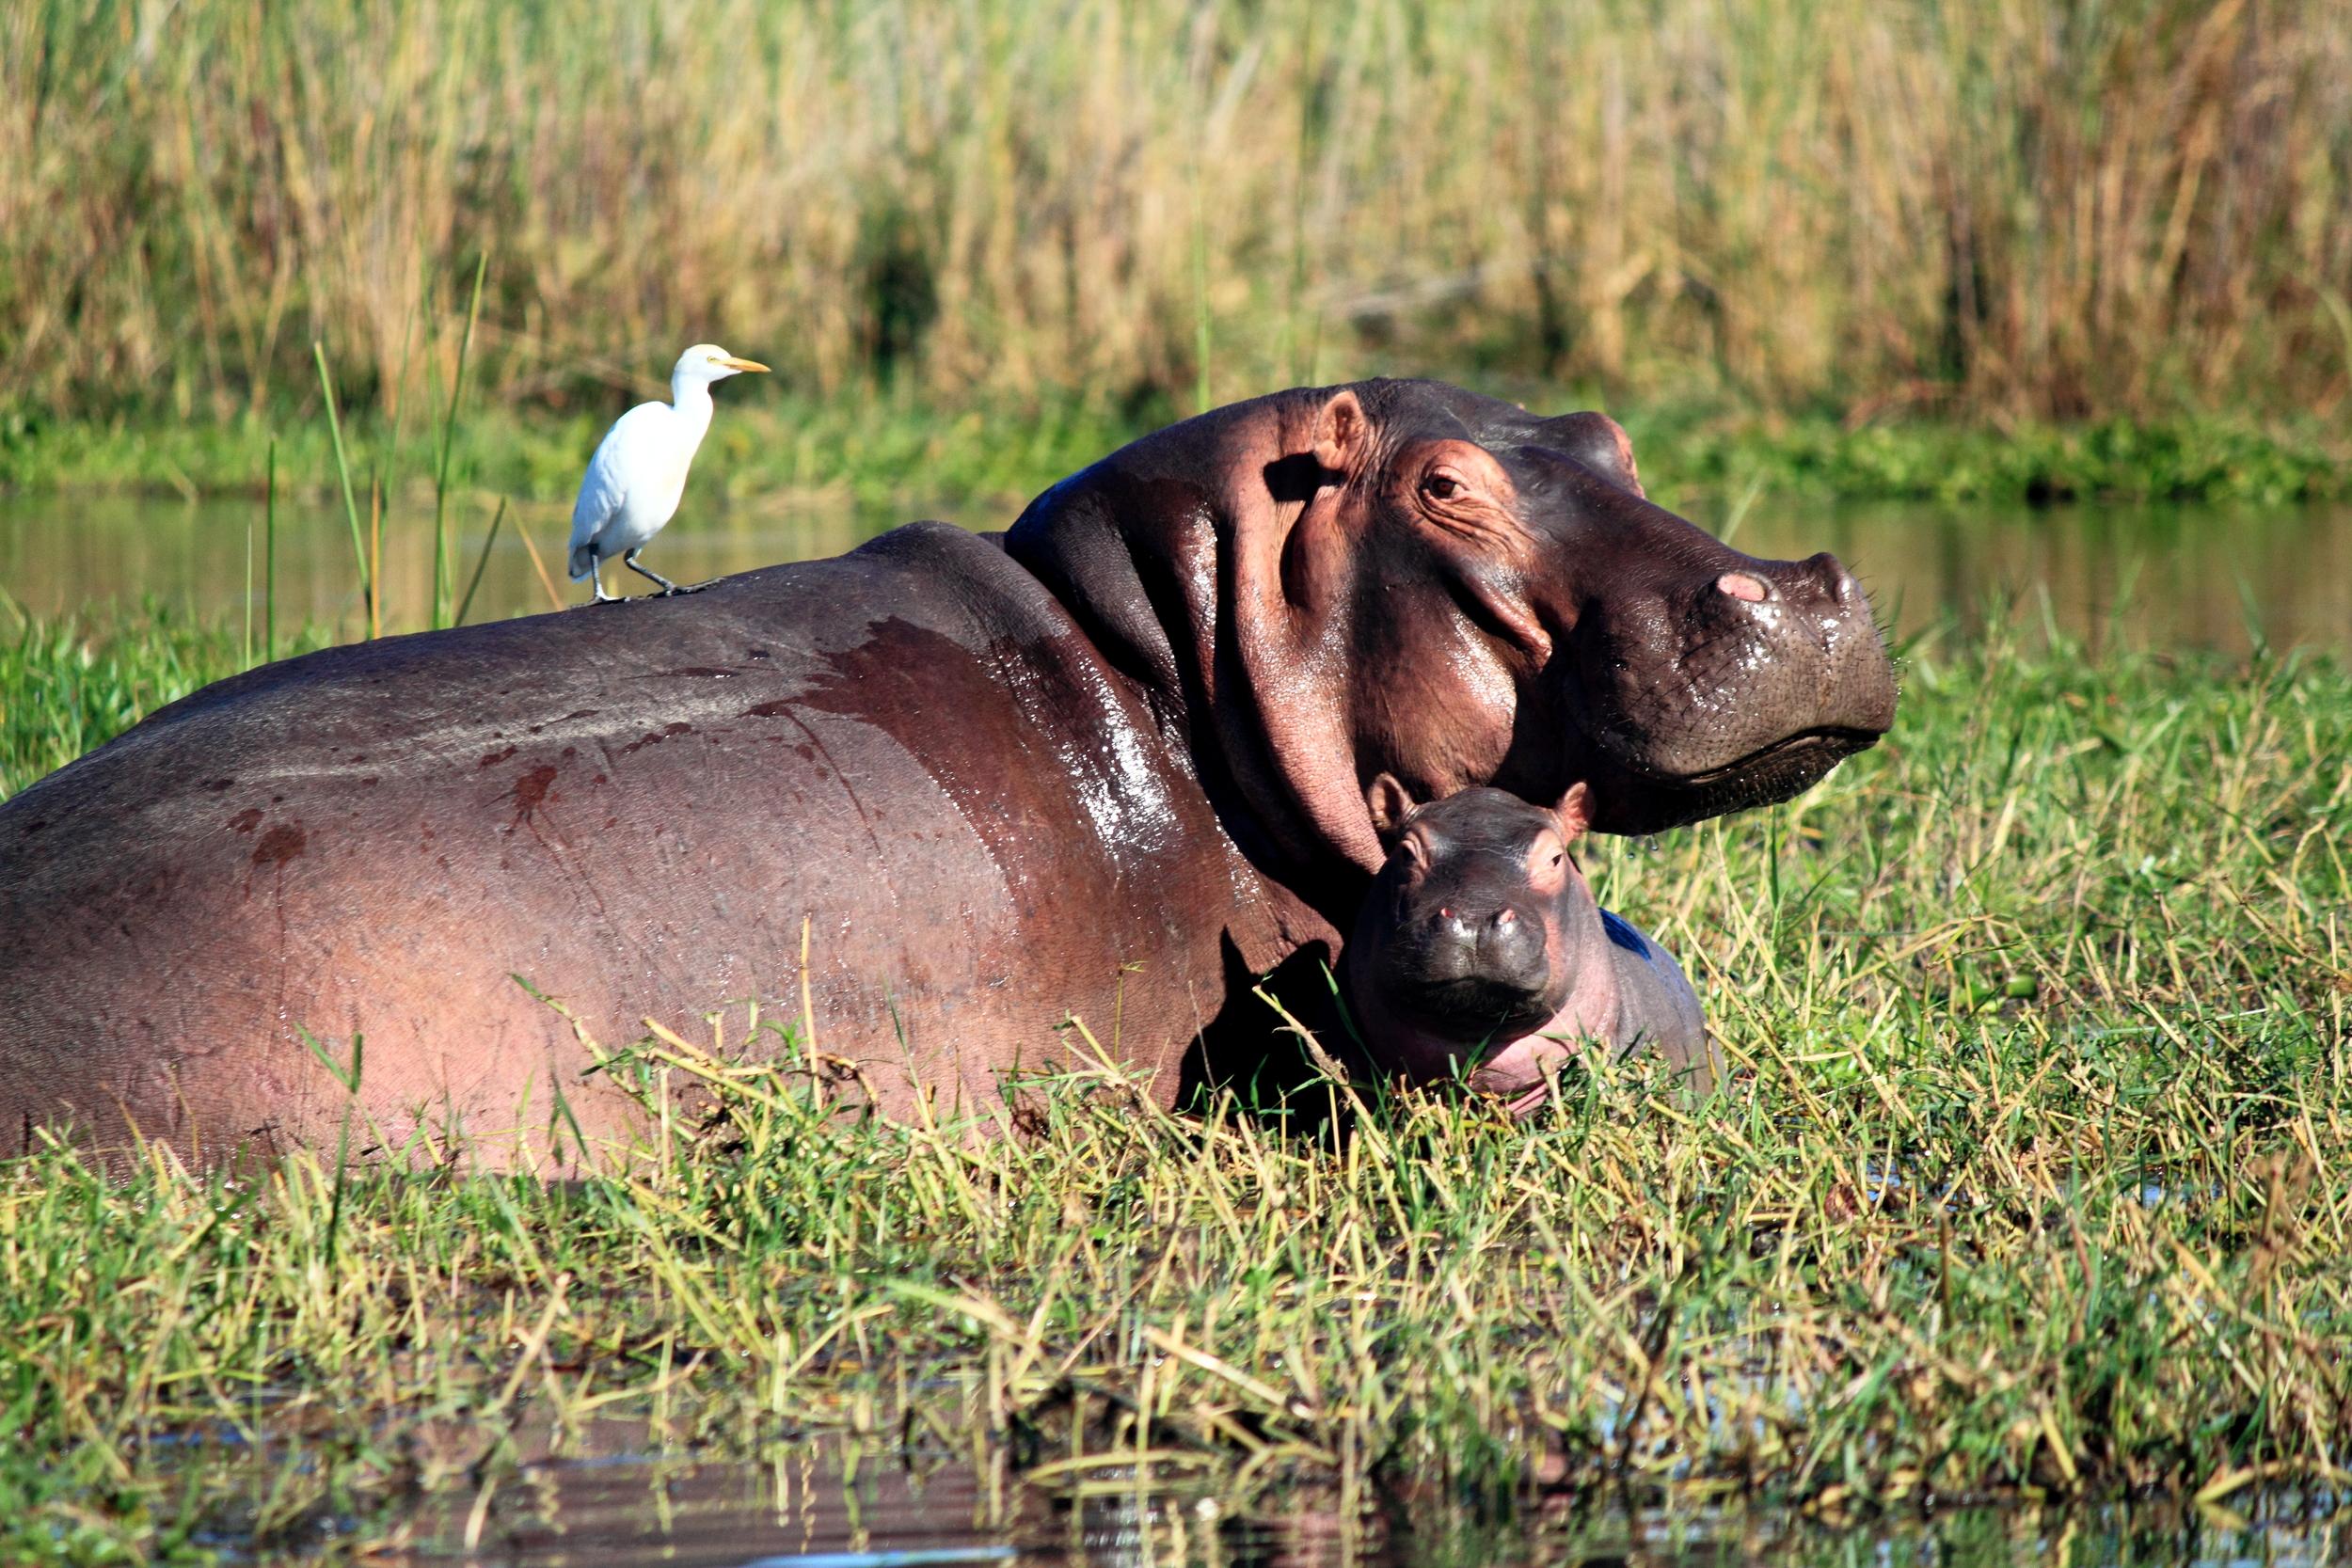 Baby Hippo and Bird_02.JPG